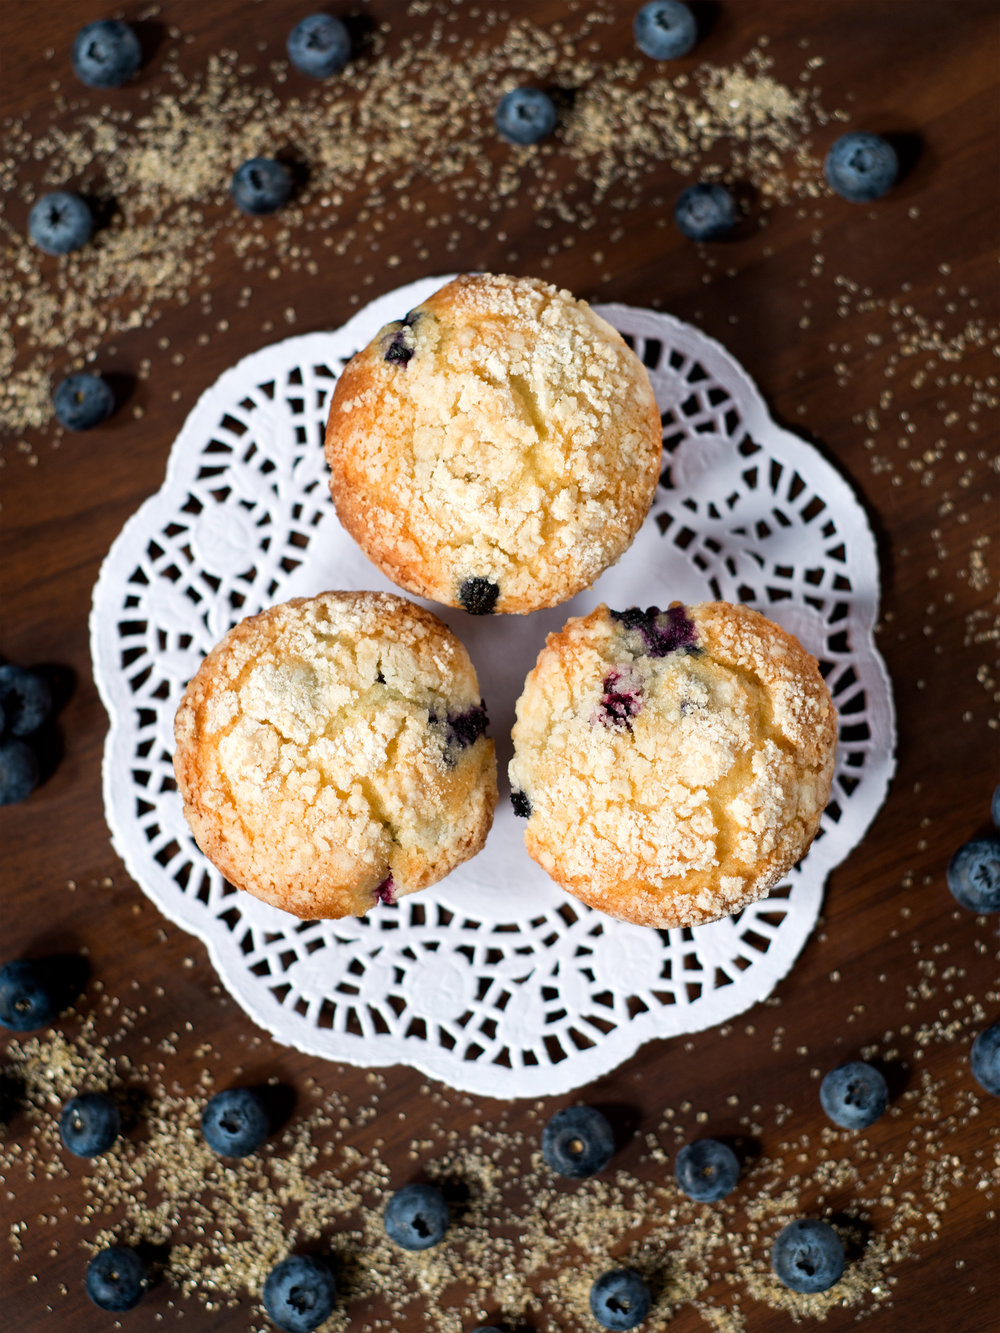 p_muffins.jpg